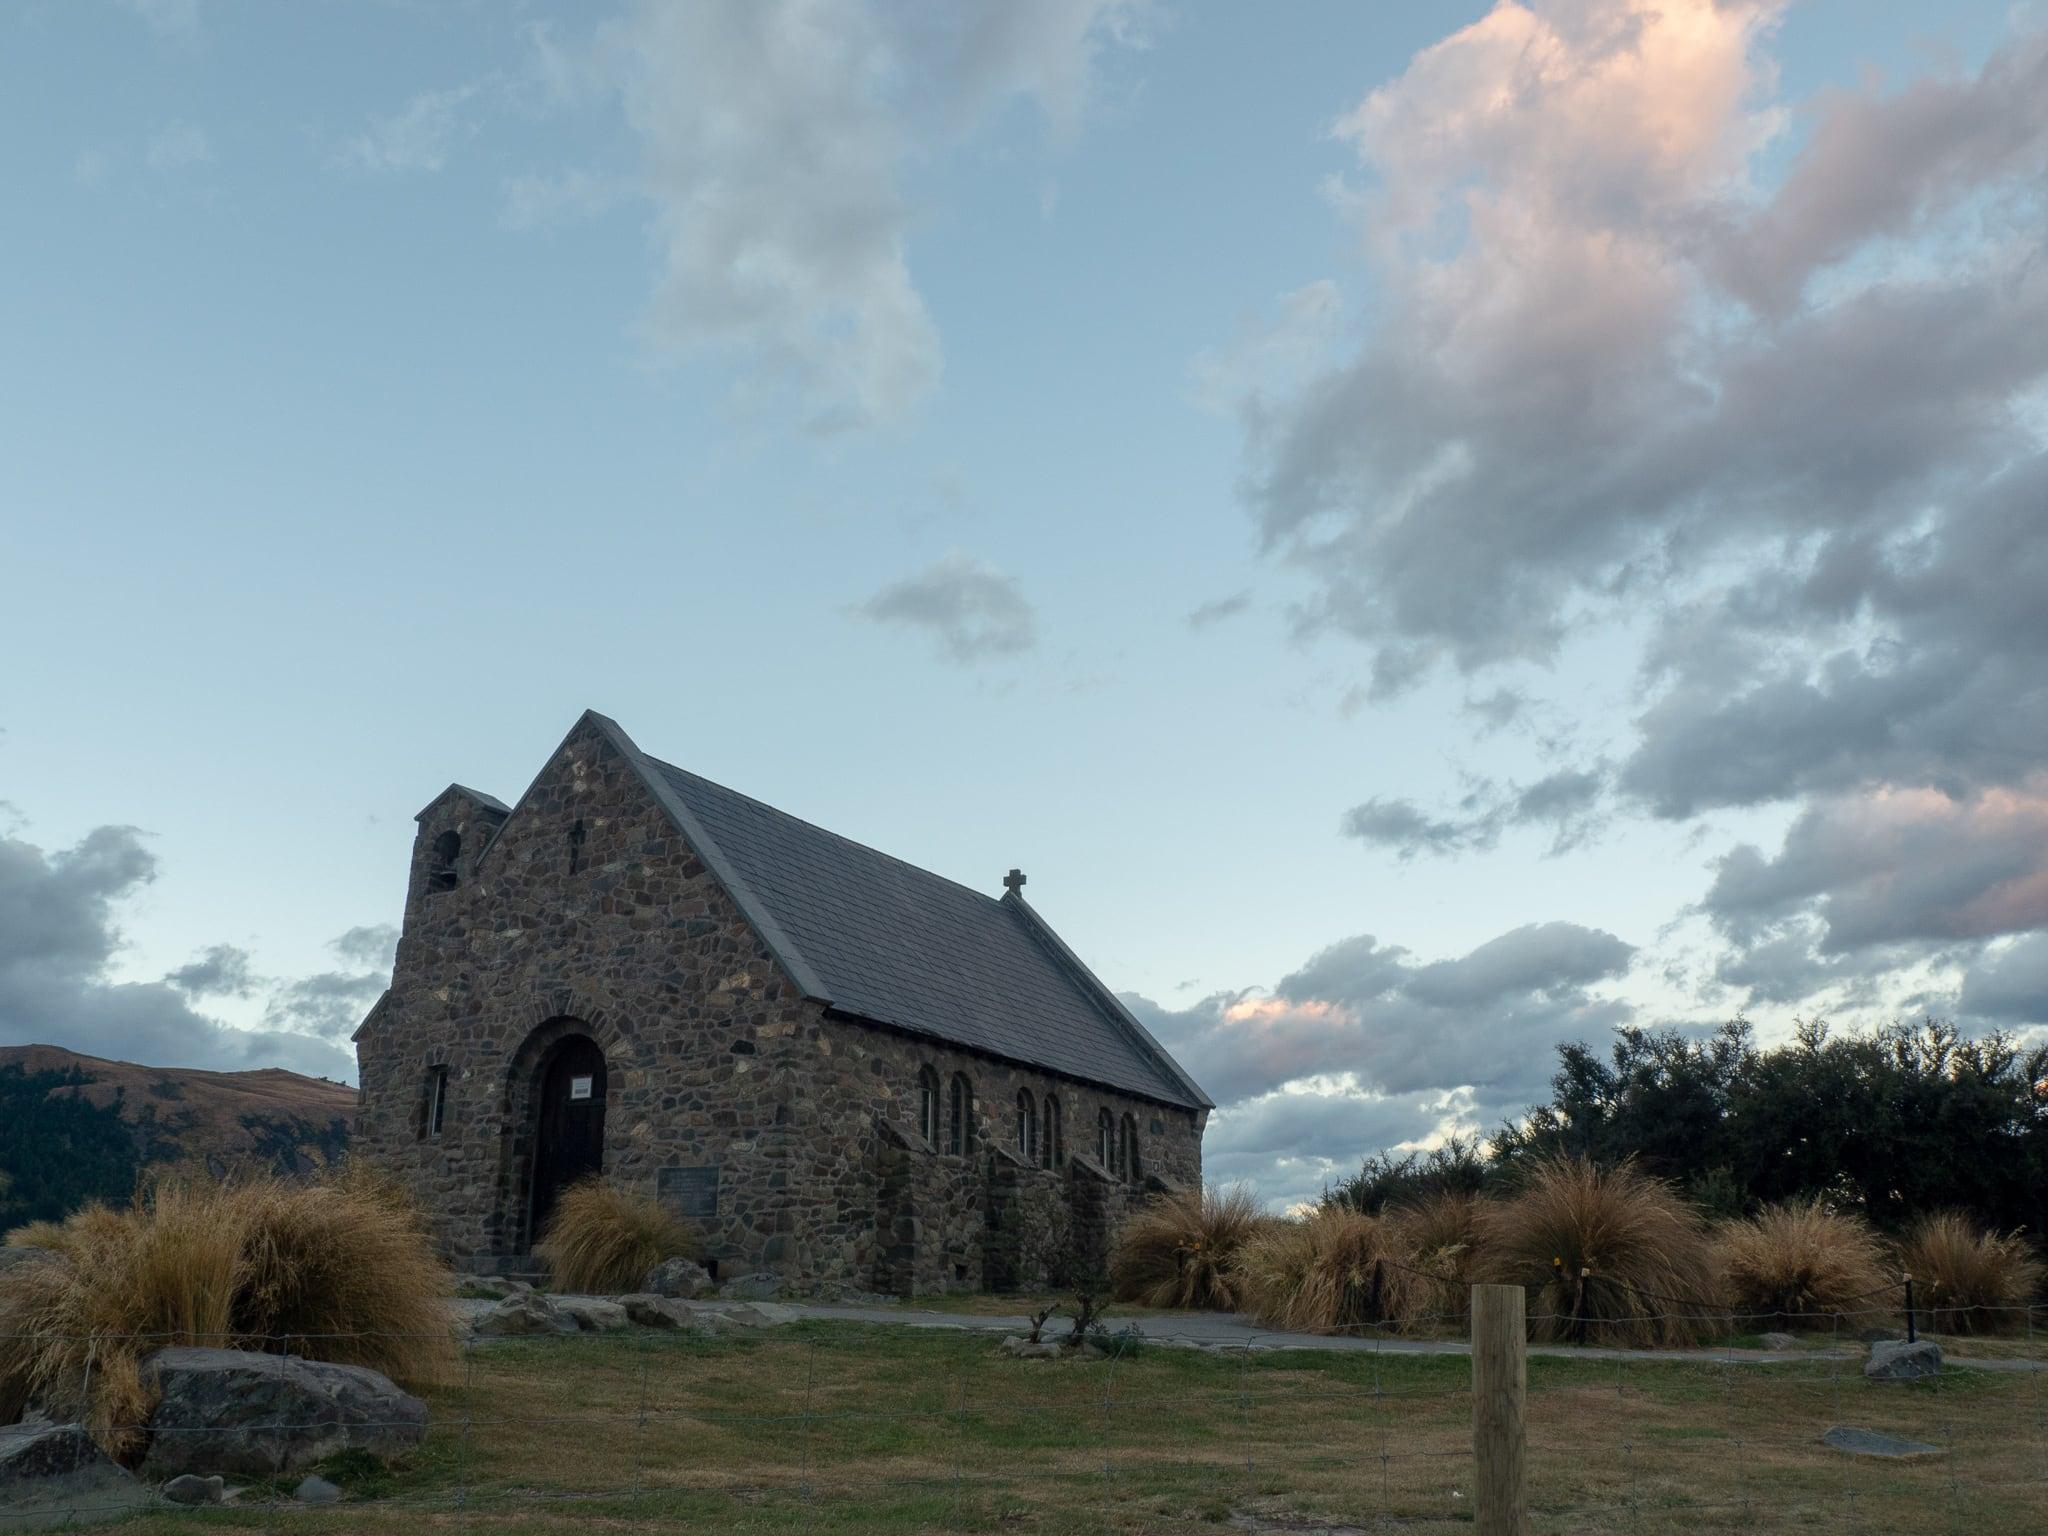 700: The Church of the Good Shepherd